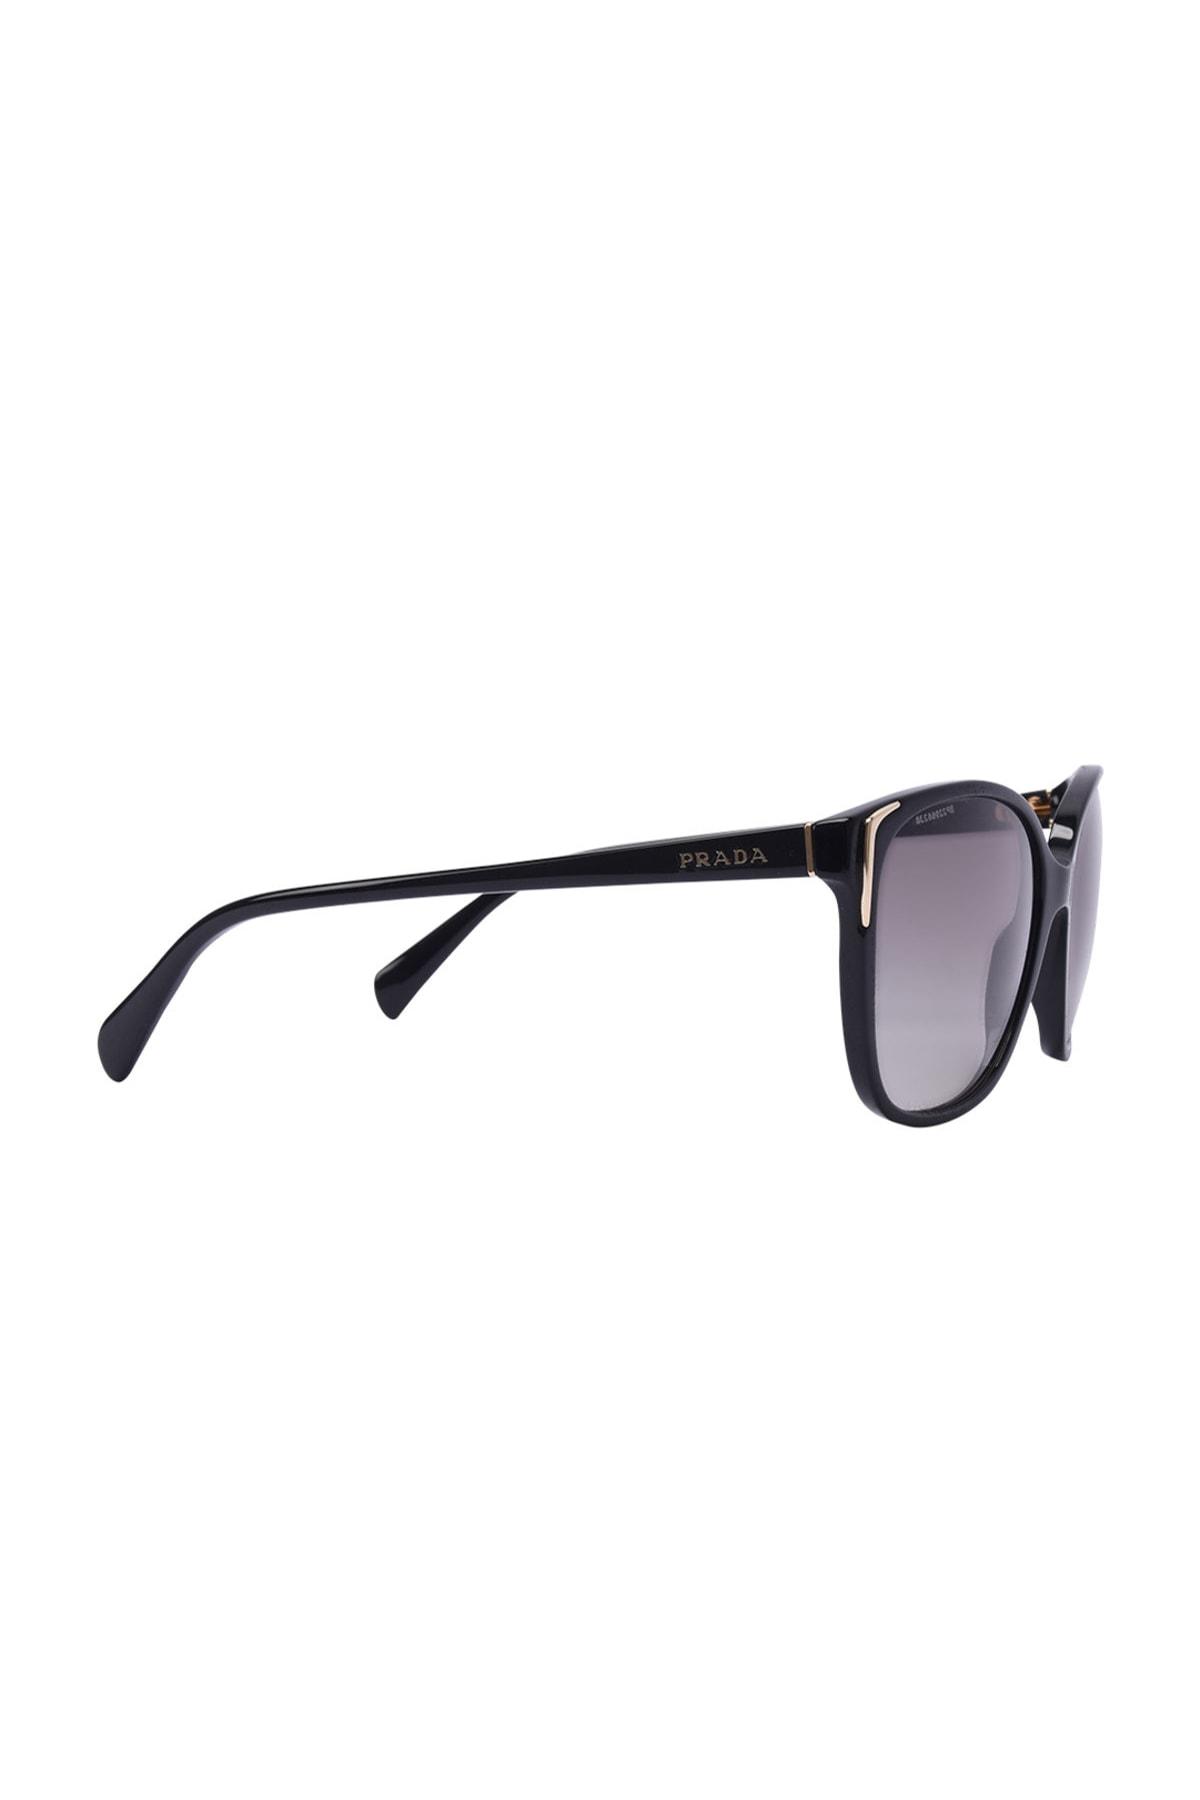 Prada Kadın Güneş Gözlüğü PR01OS1AB3M155-T1 1